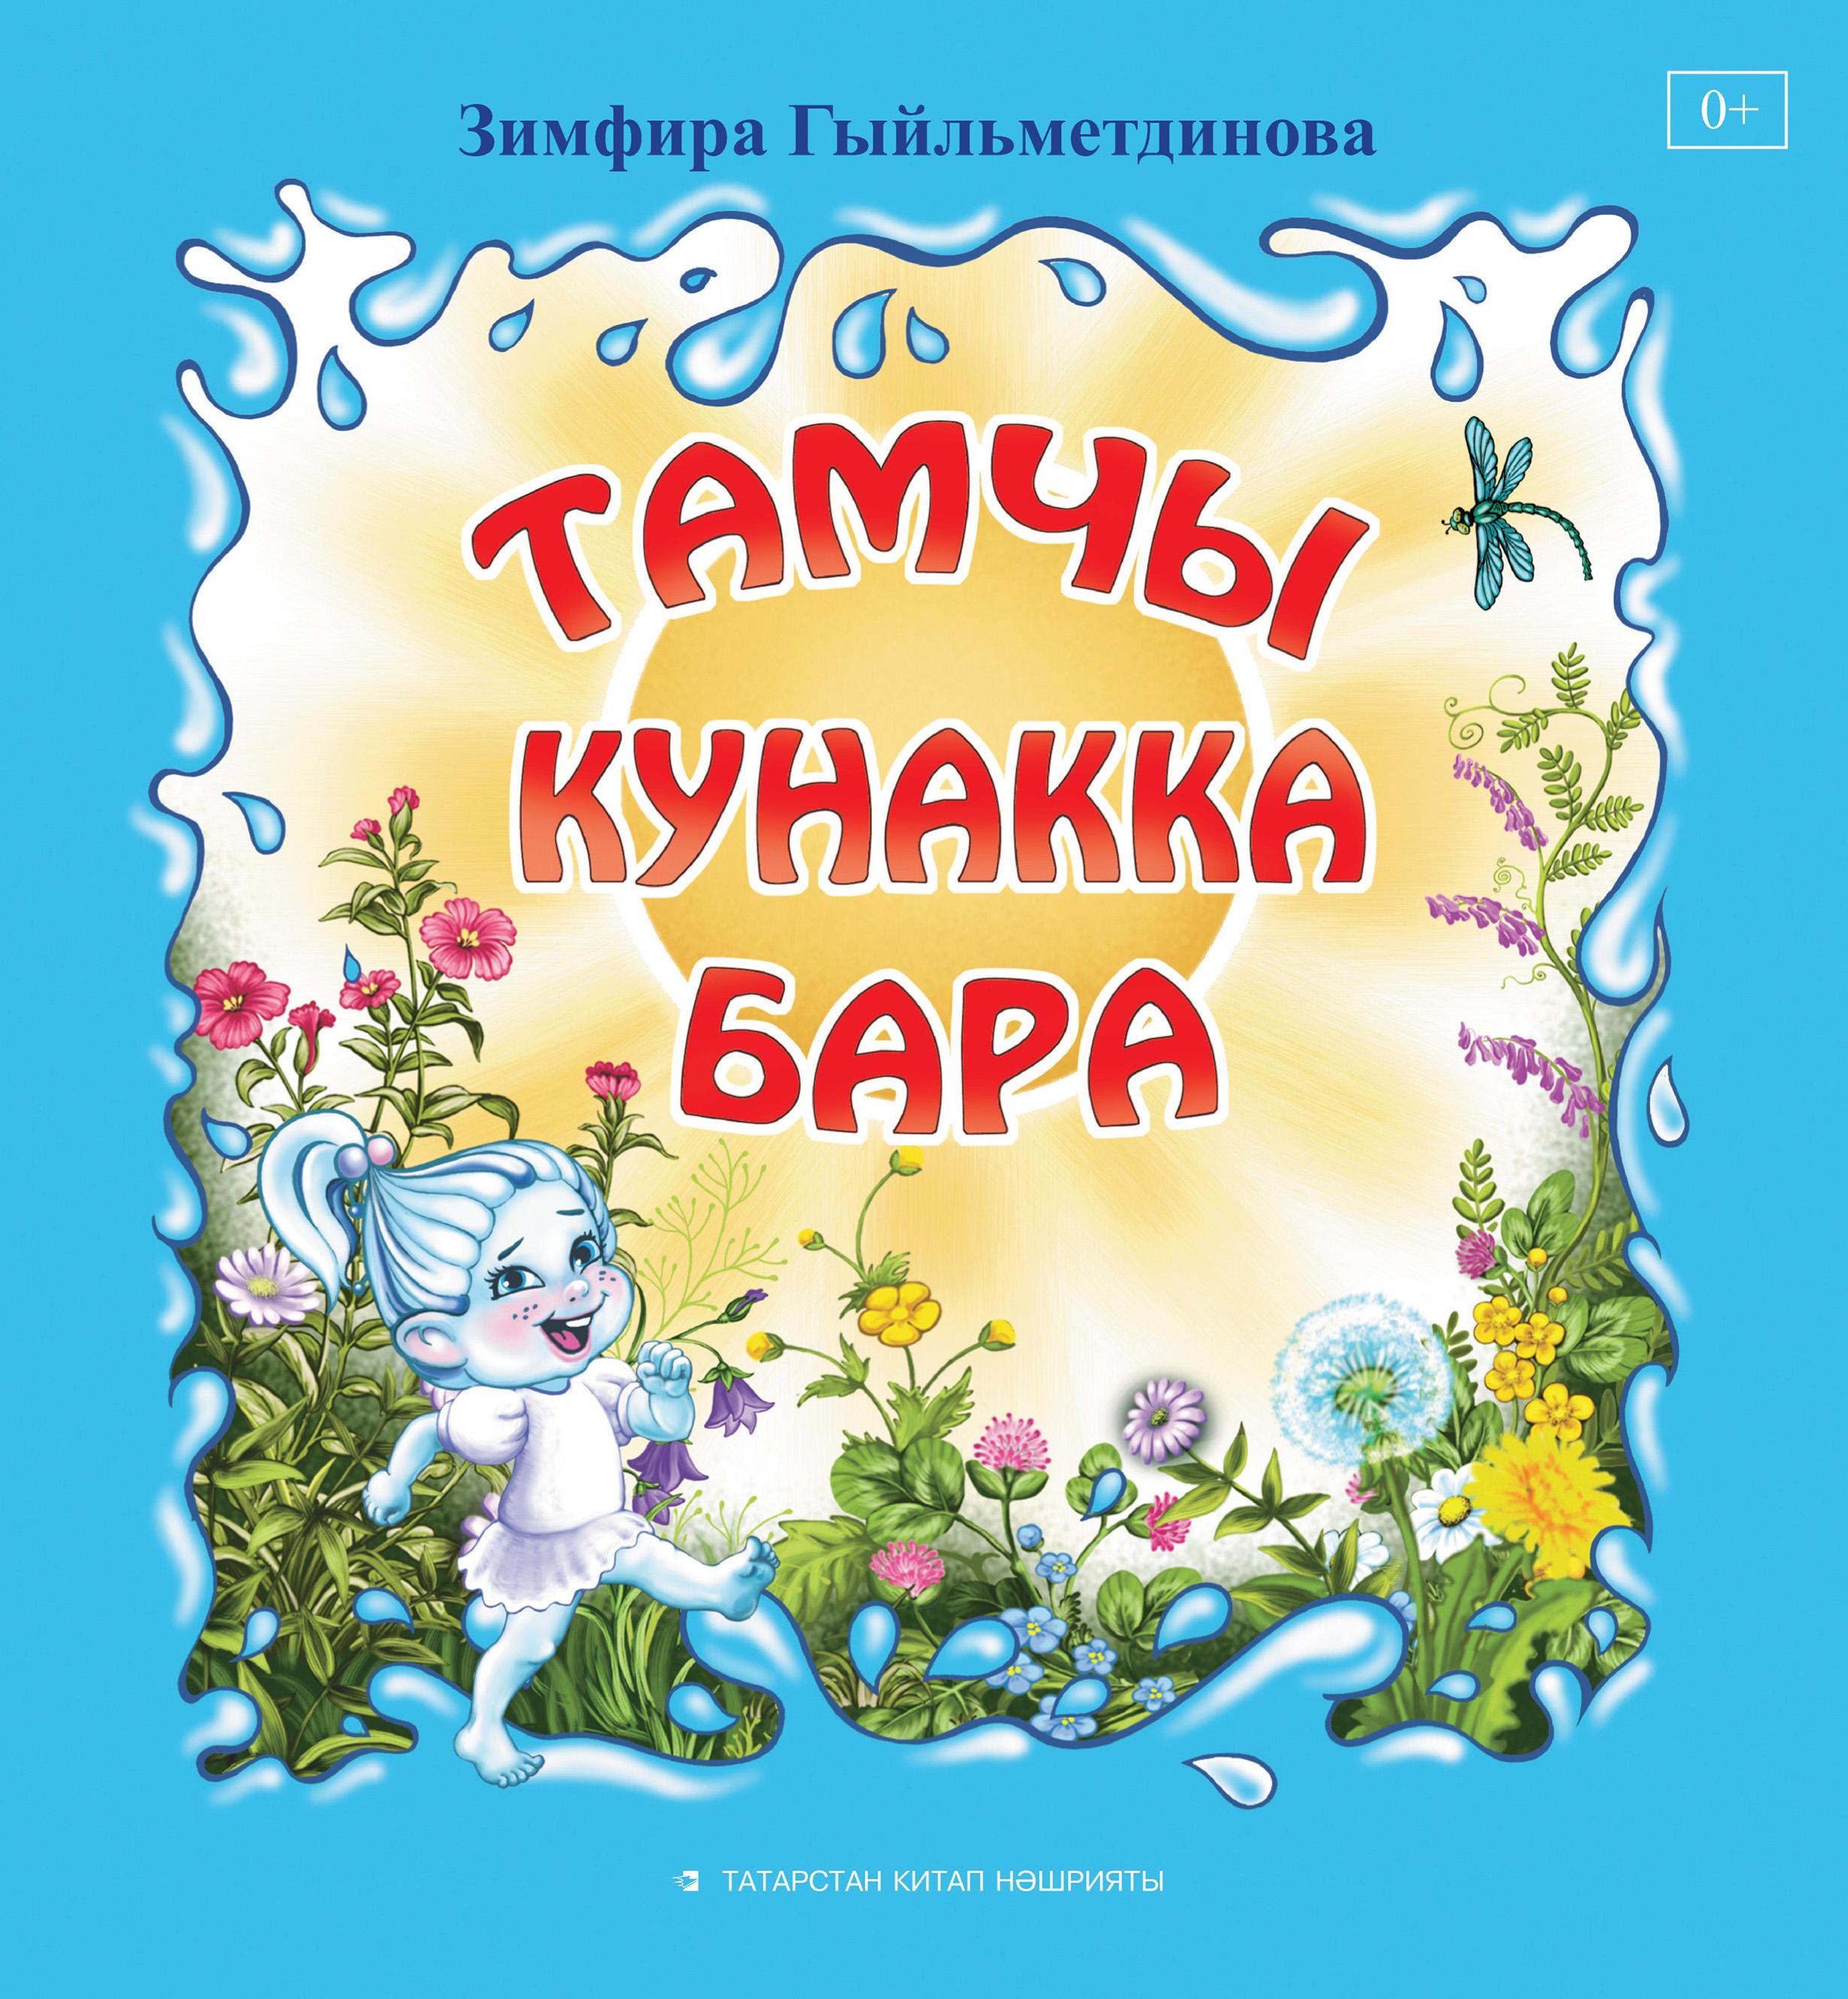 Зимфира Гильмутдинова Тамчы кунакка бара